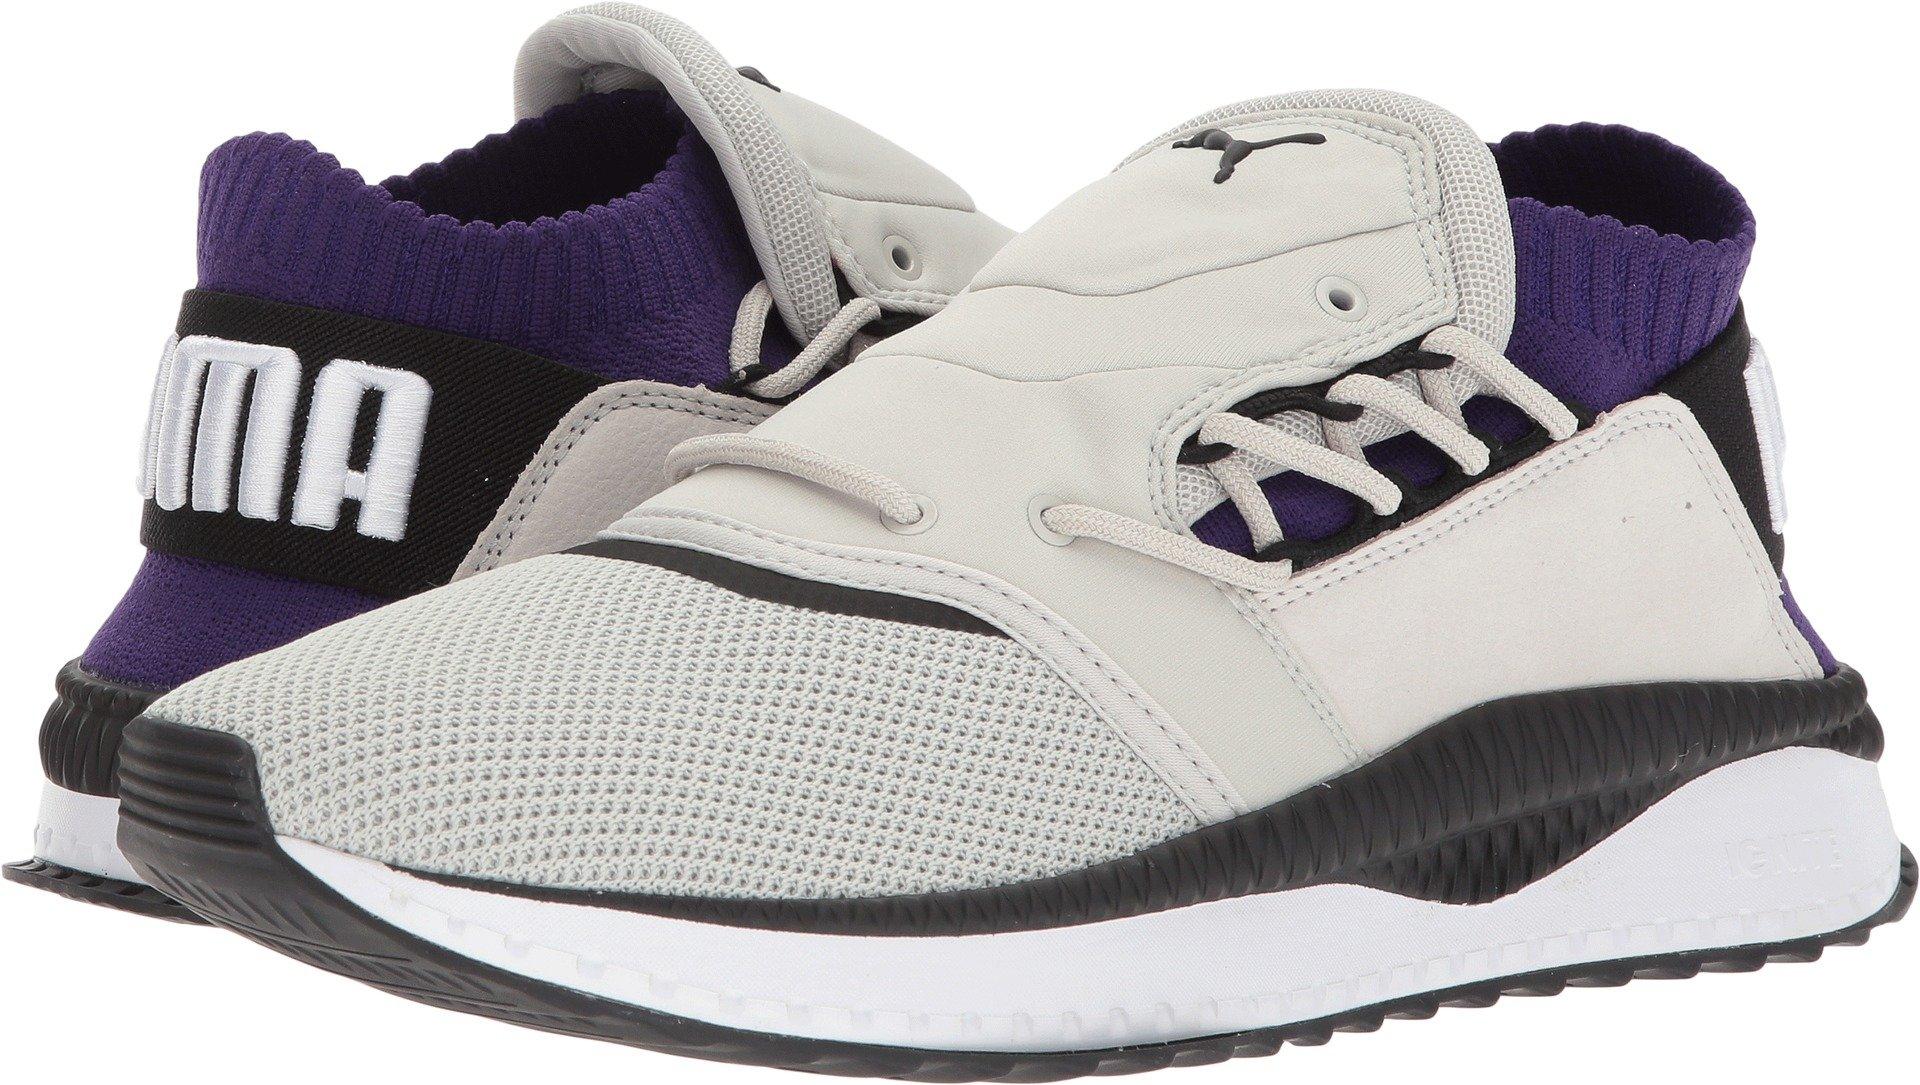 PUMA Select Men's Tsugi Shinsei Dual Sneakers, Grey/Grape/White, 10.5 M US